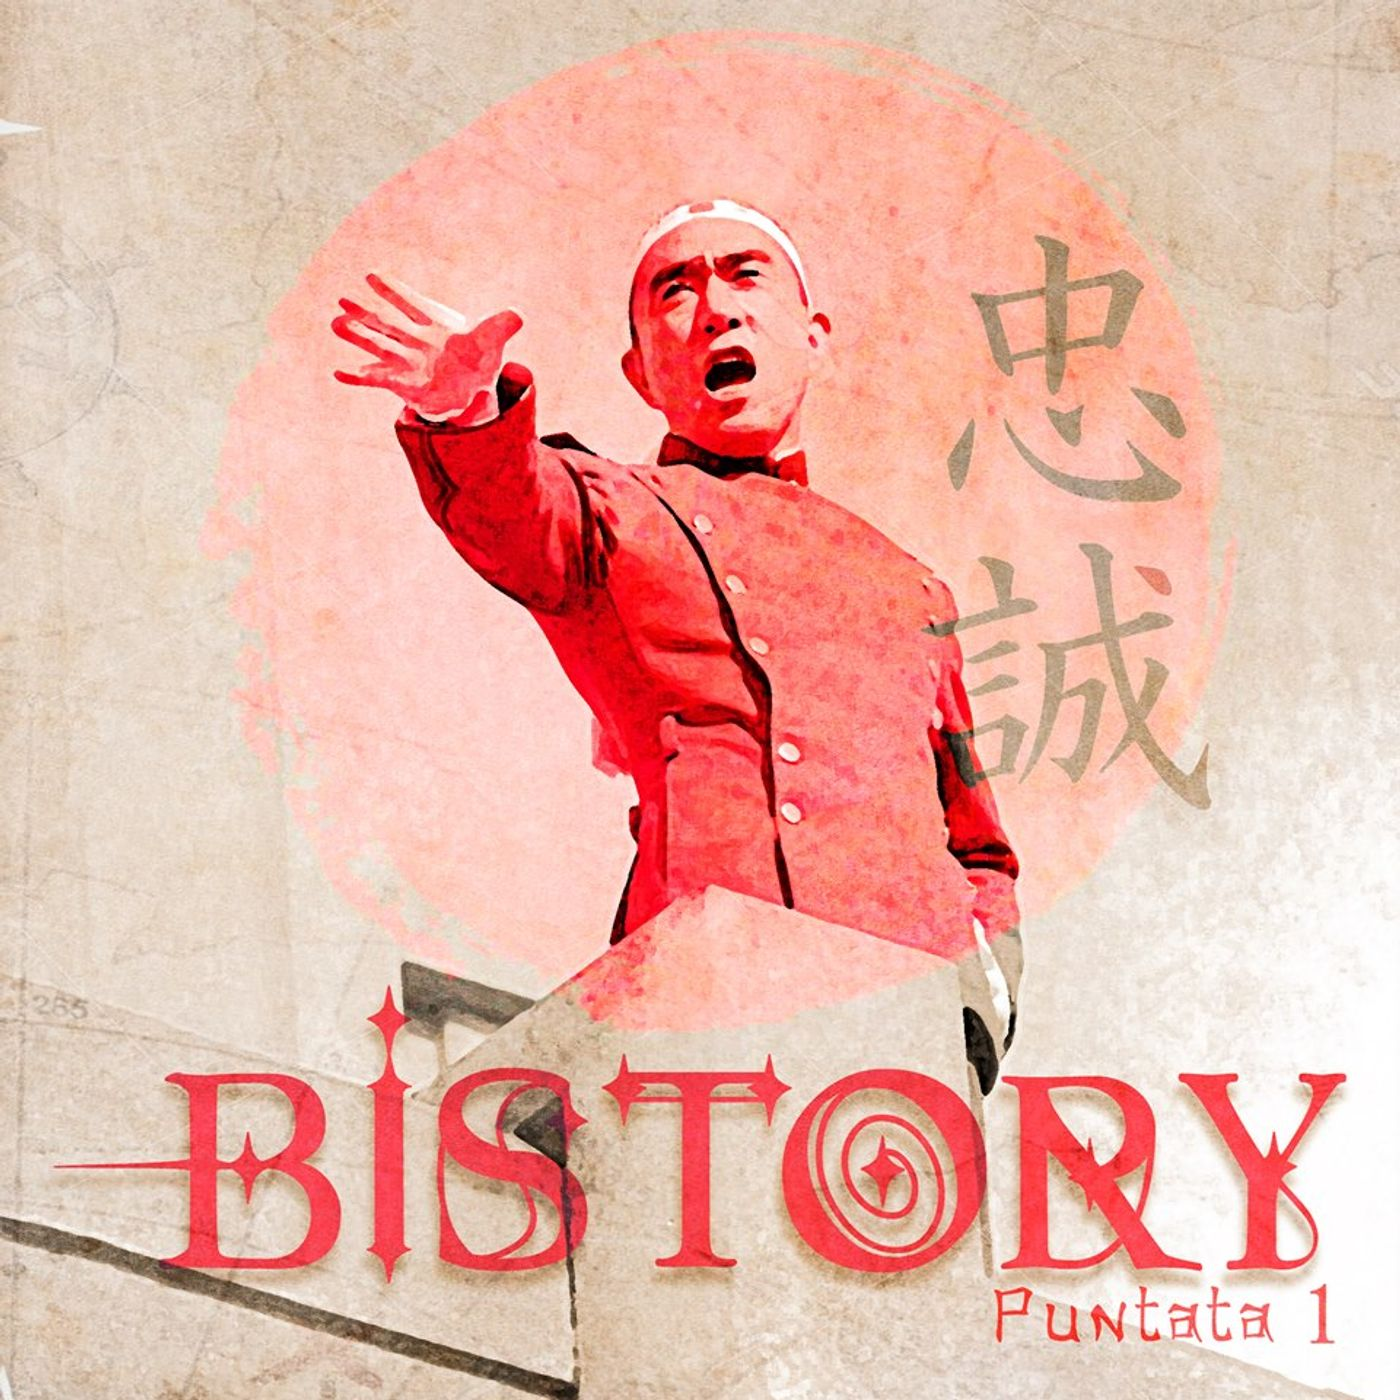 Bistory S01E01 - Yukio Mishima